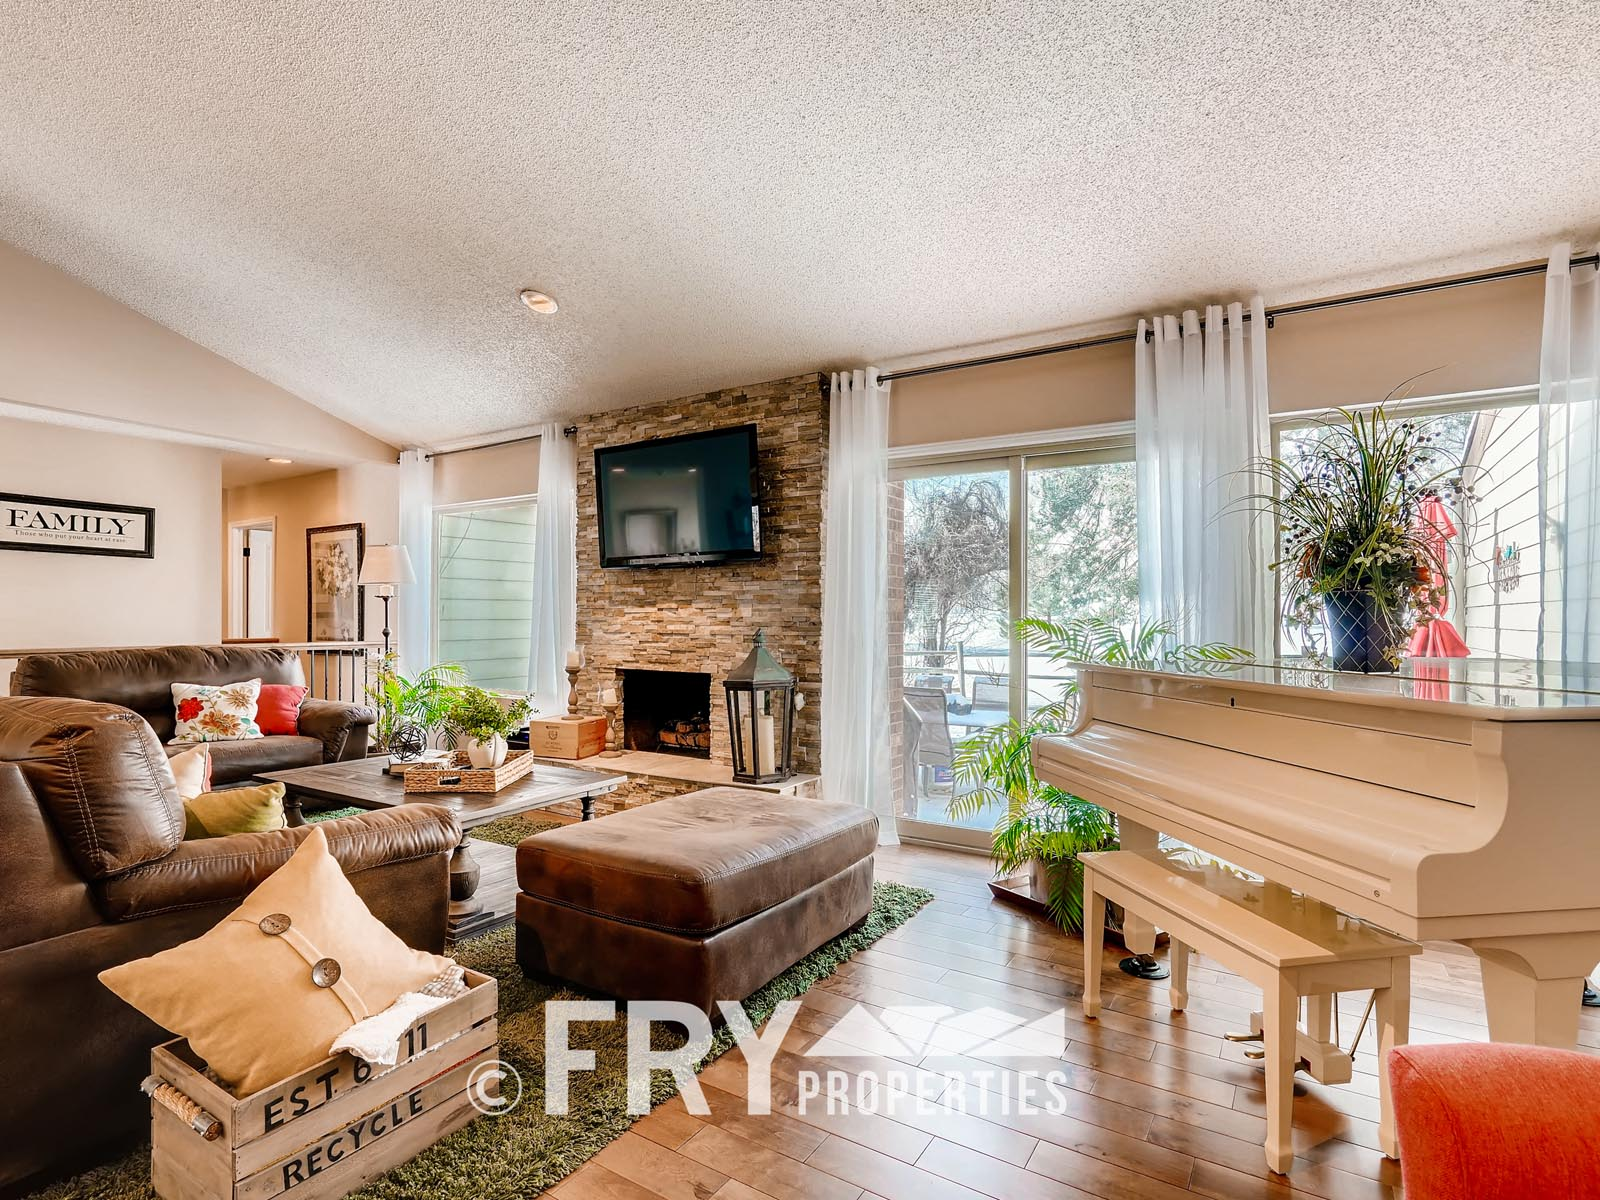 6305 W 6th Ave Unit A6-print-003-8-Living Room-3600x2400-300dpi